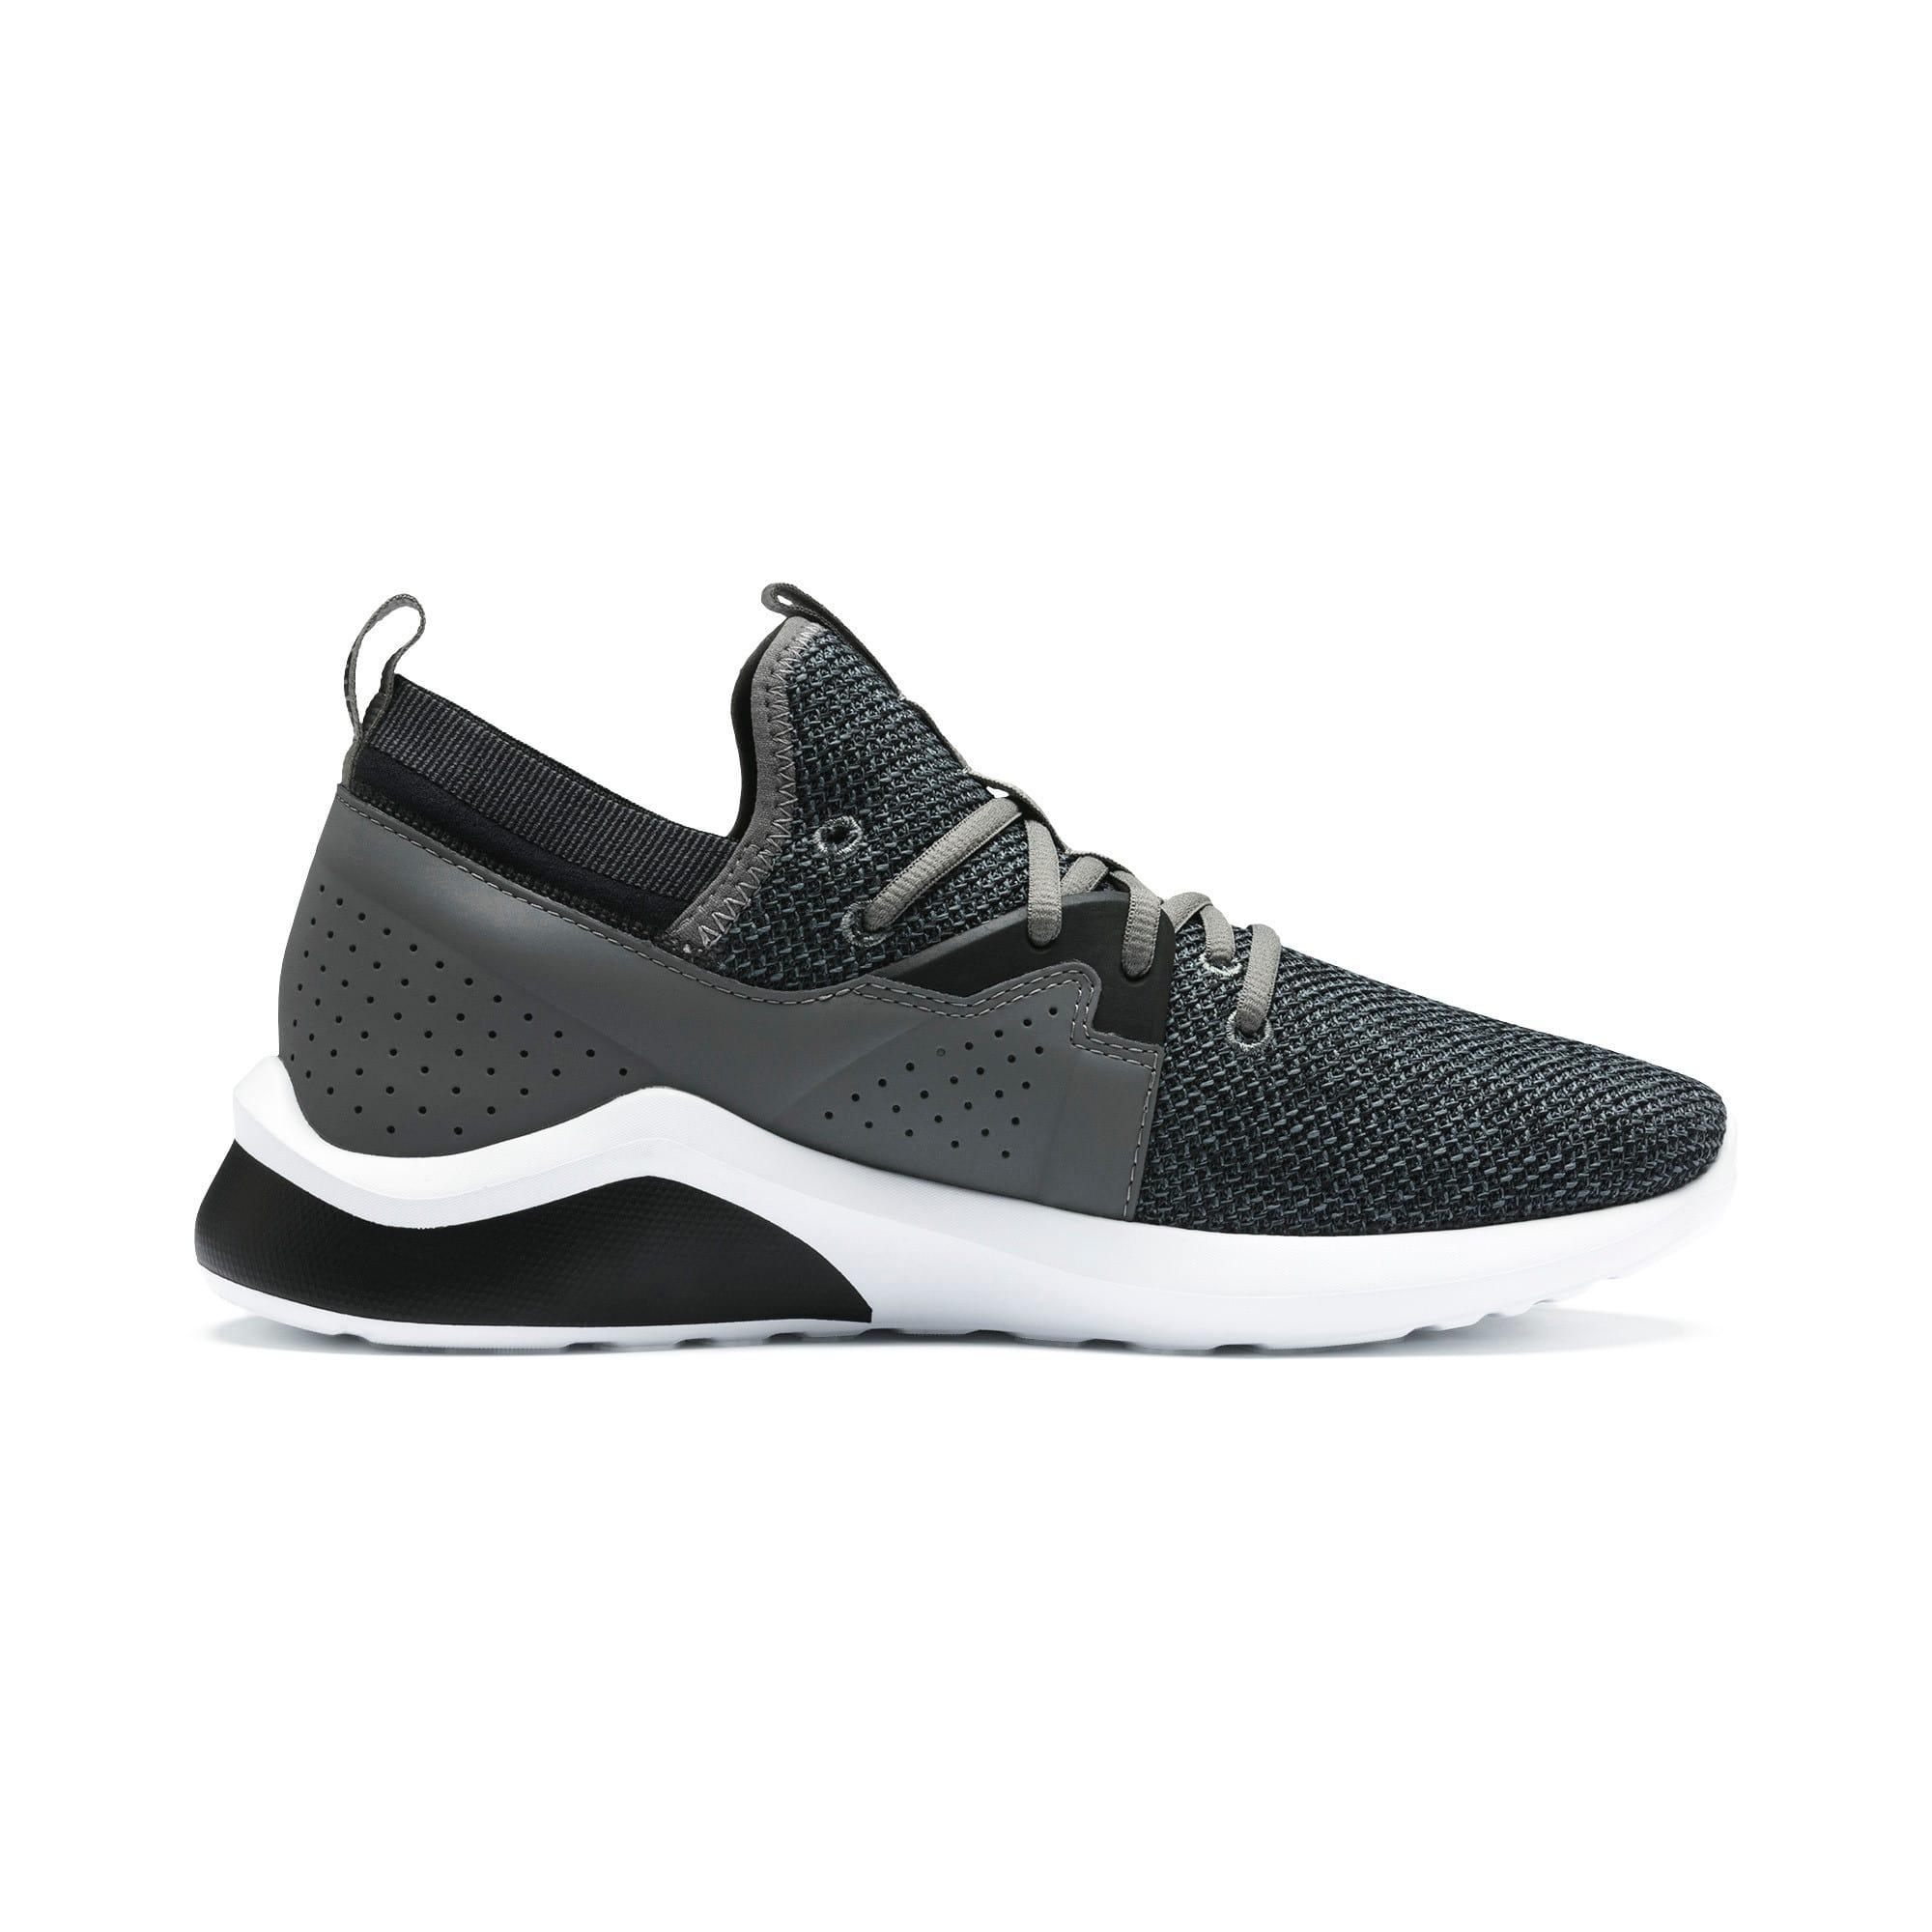 Miniatura 6 de Zapatos deportivos Emergence para hombre, CASTLEROCK-Puma Black, mediano